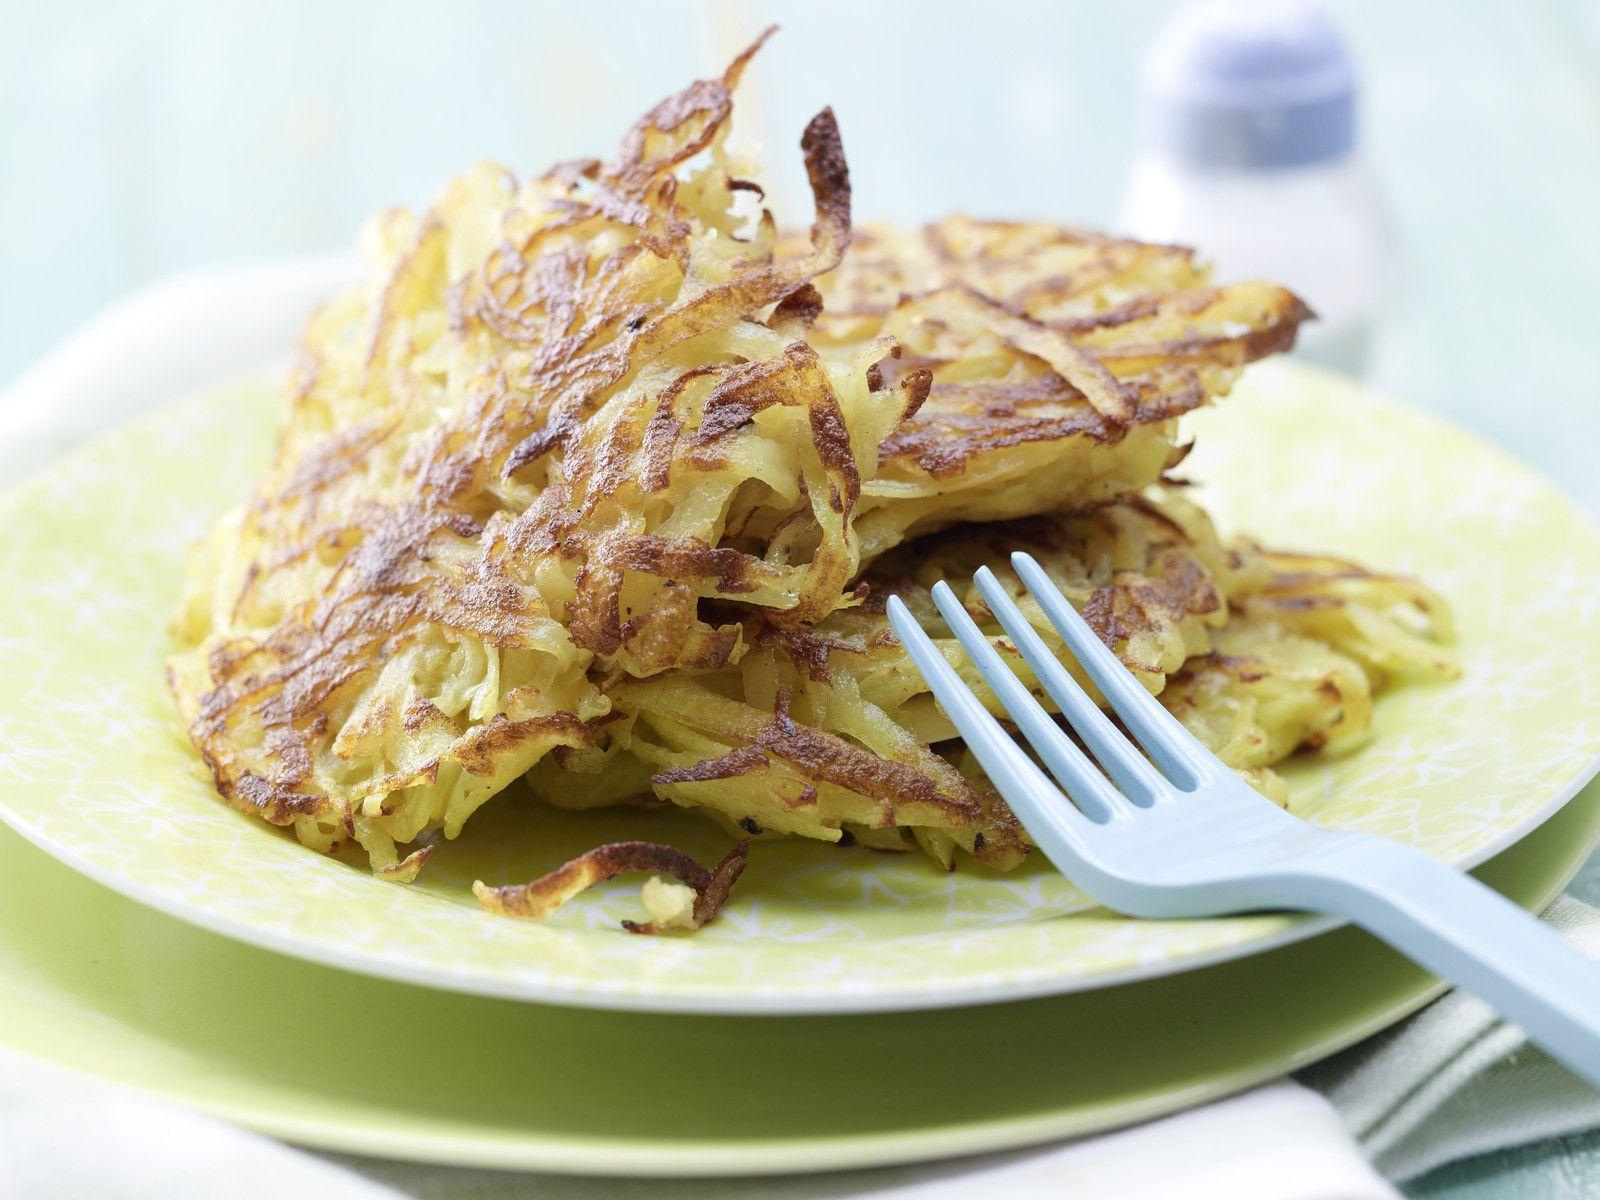 rösti aus gekochten kartoffeln